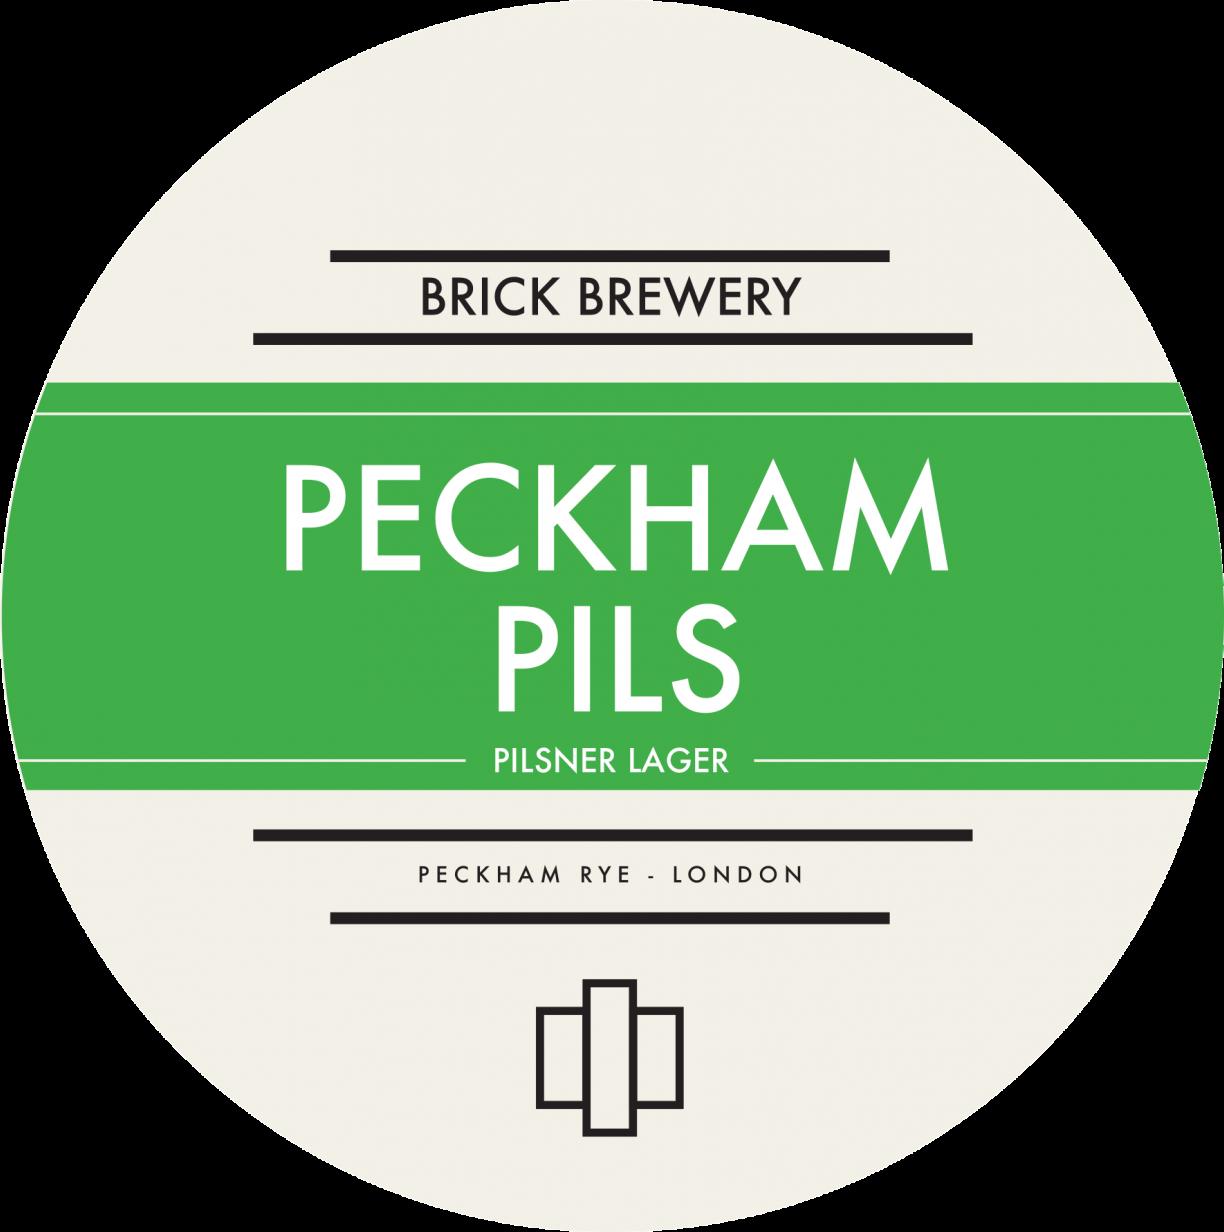 peckham-pils-brick-brewery